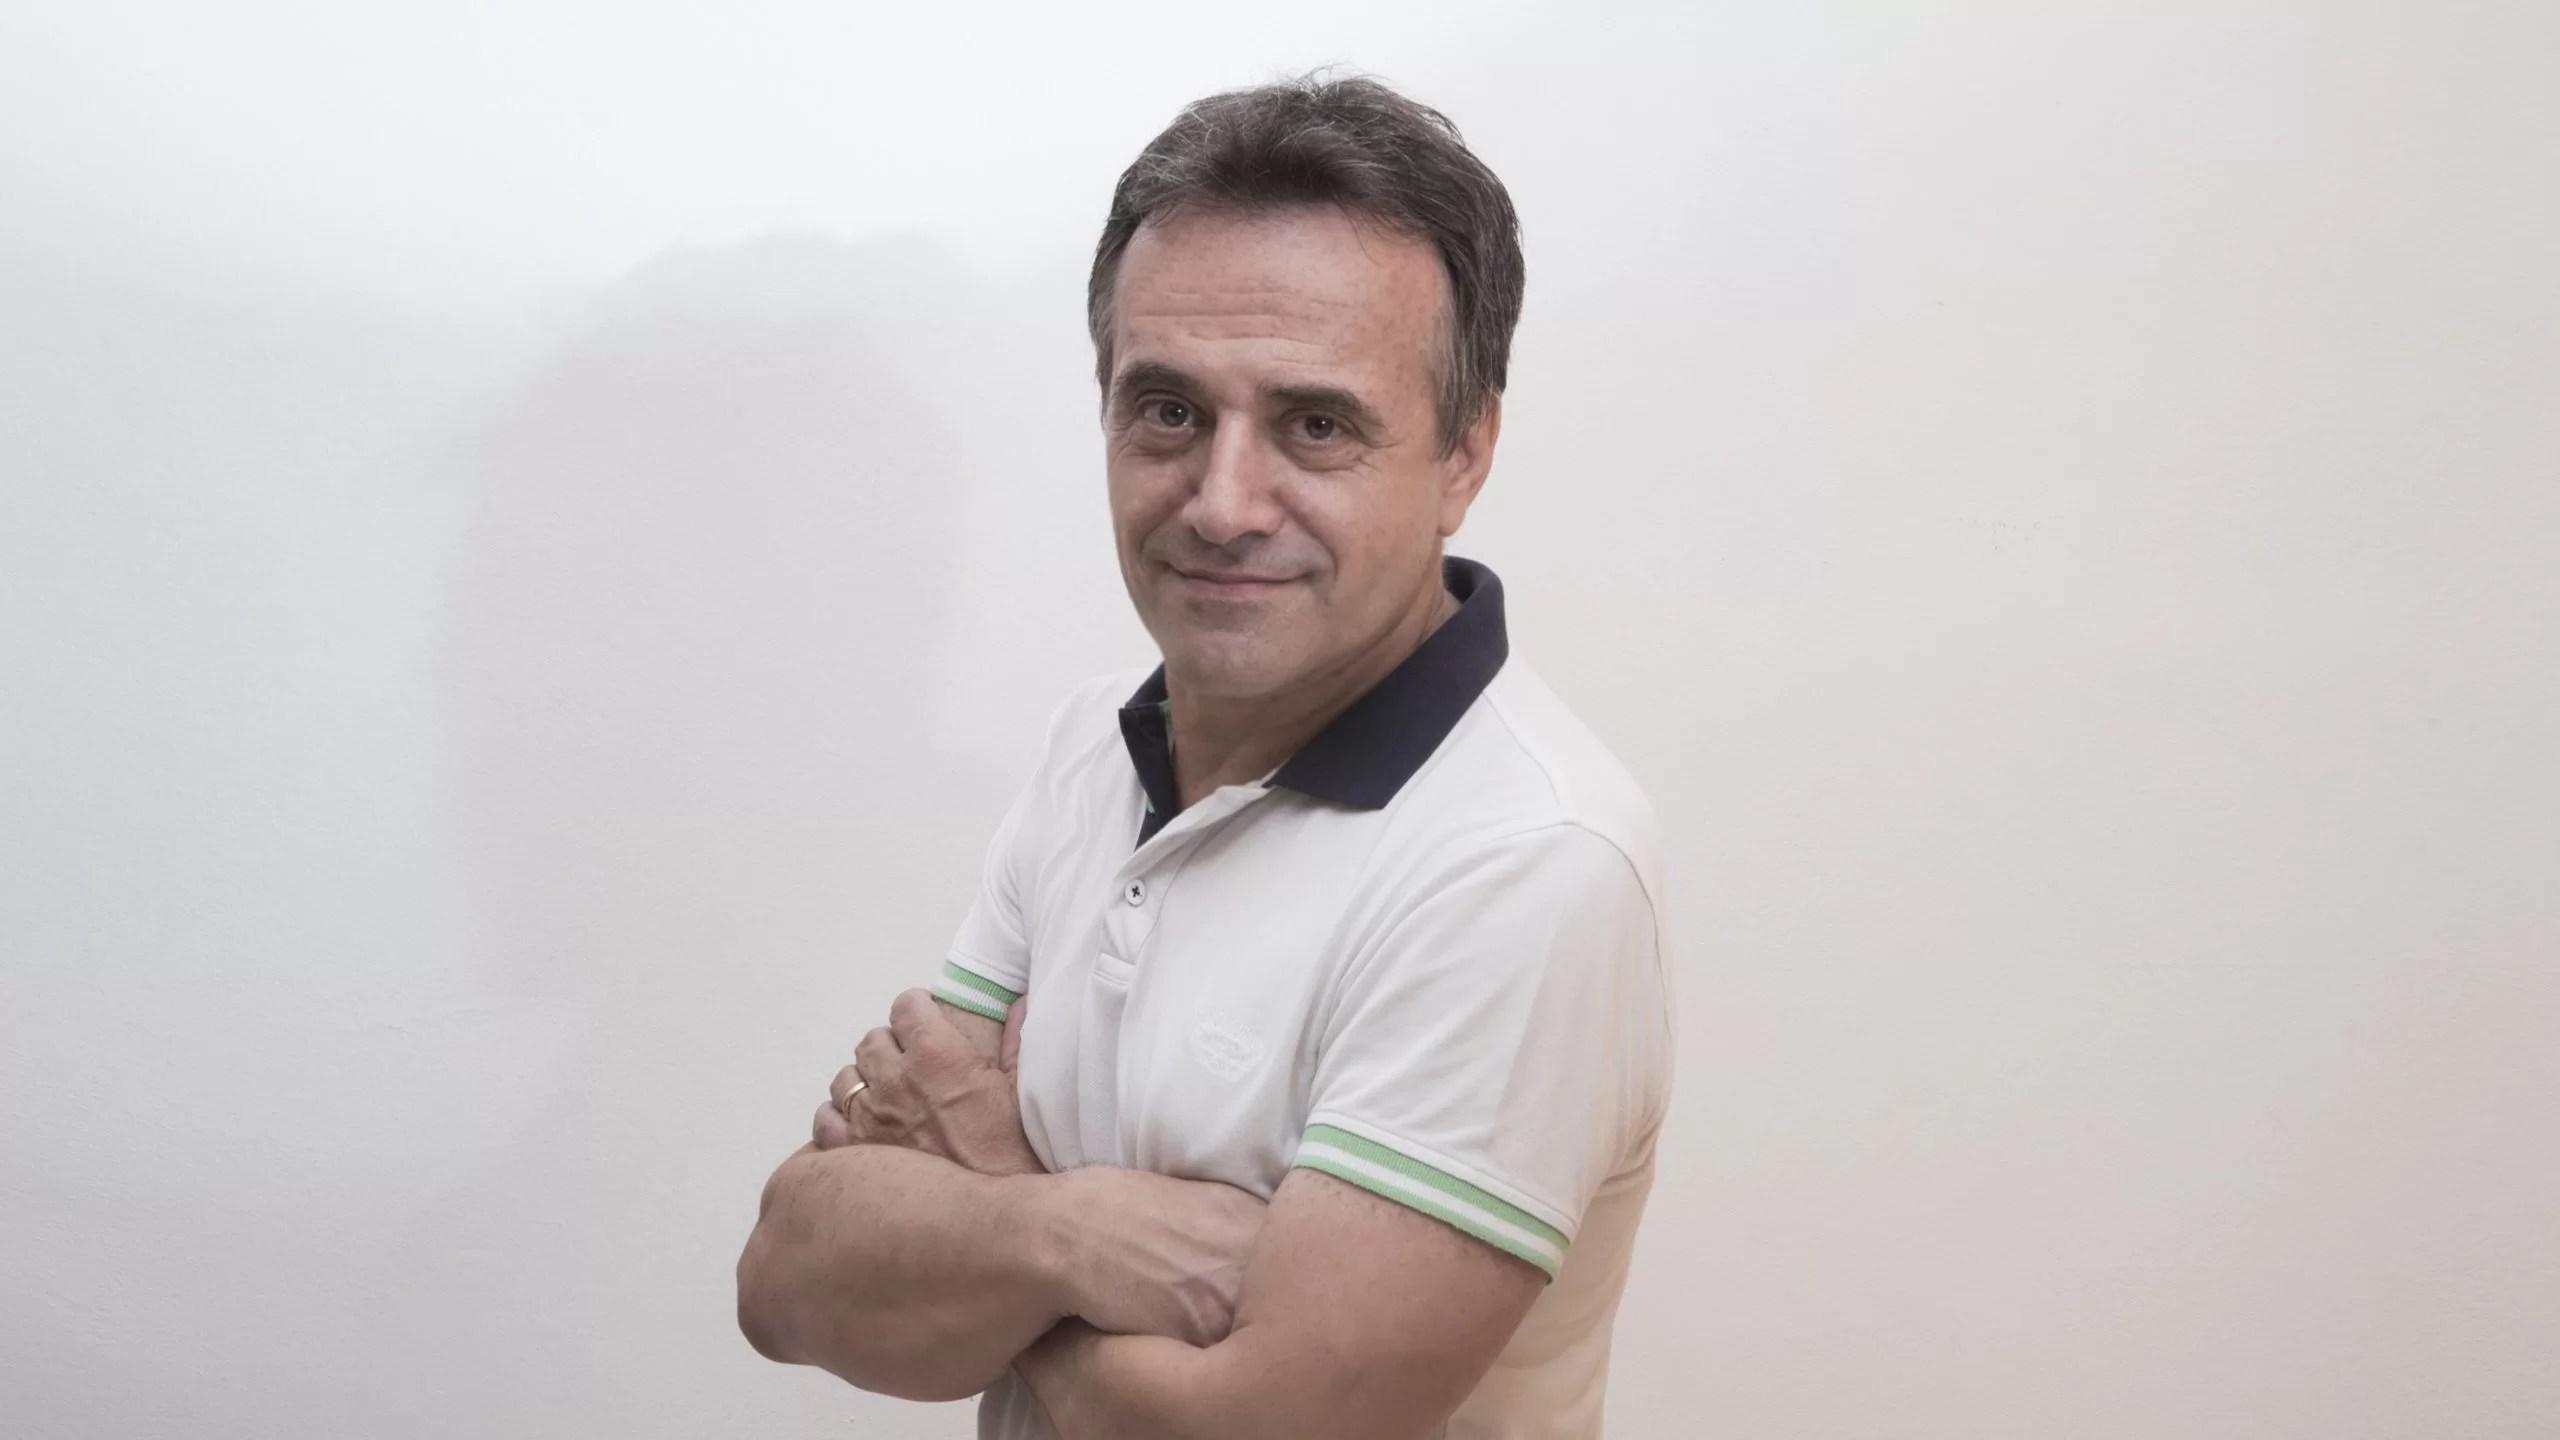 Ivano Lualdi